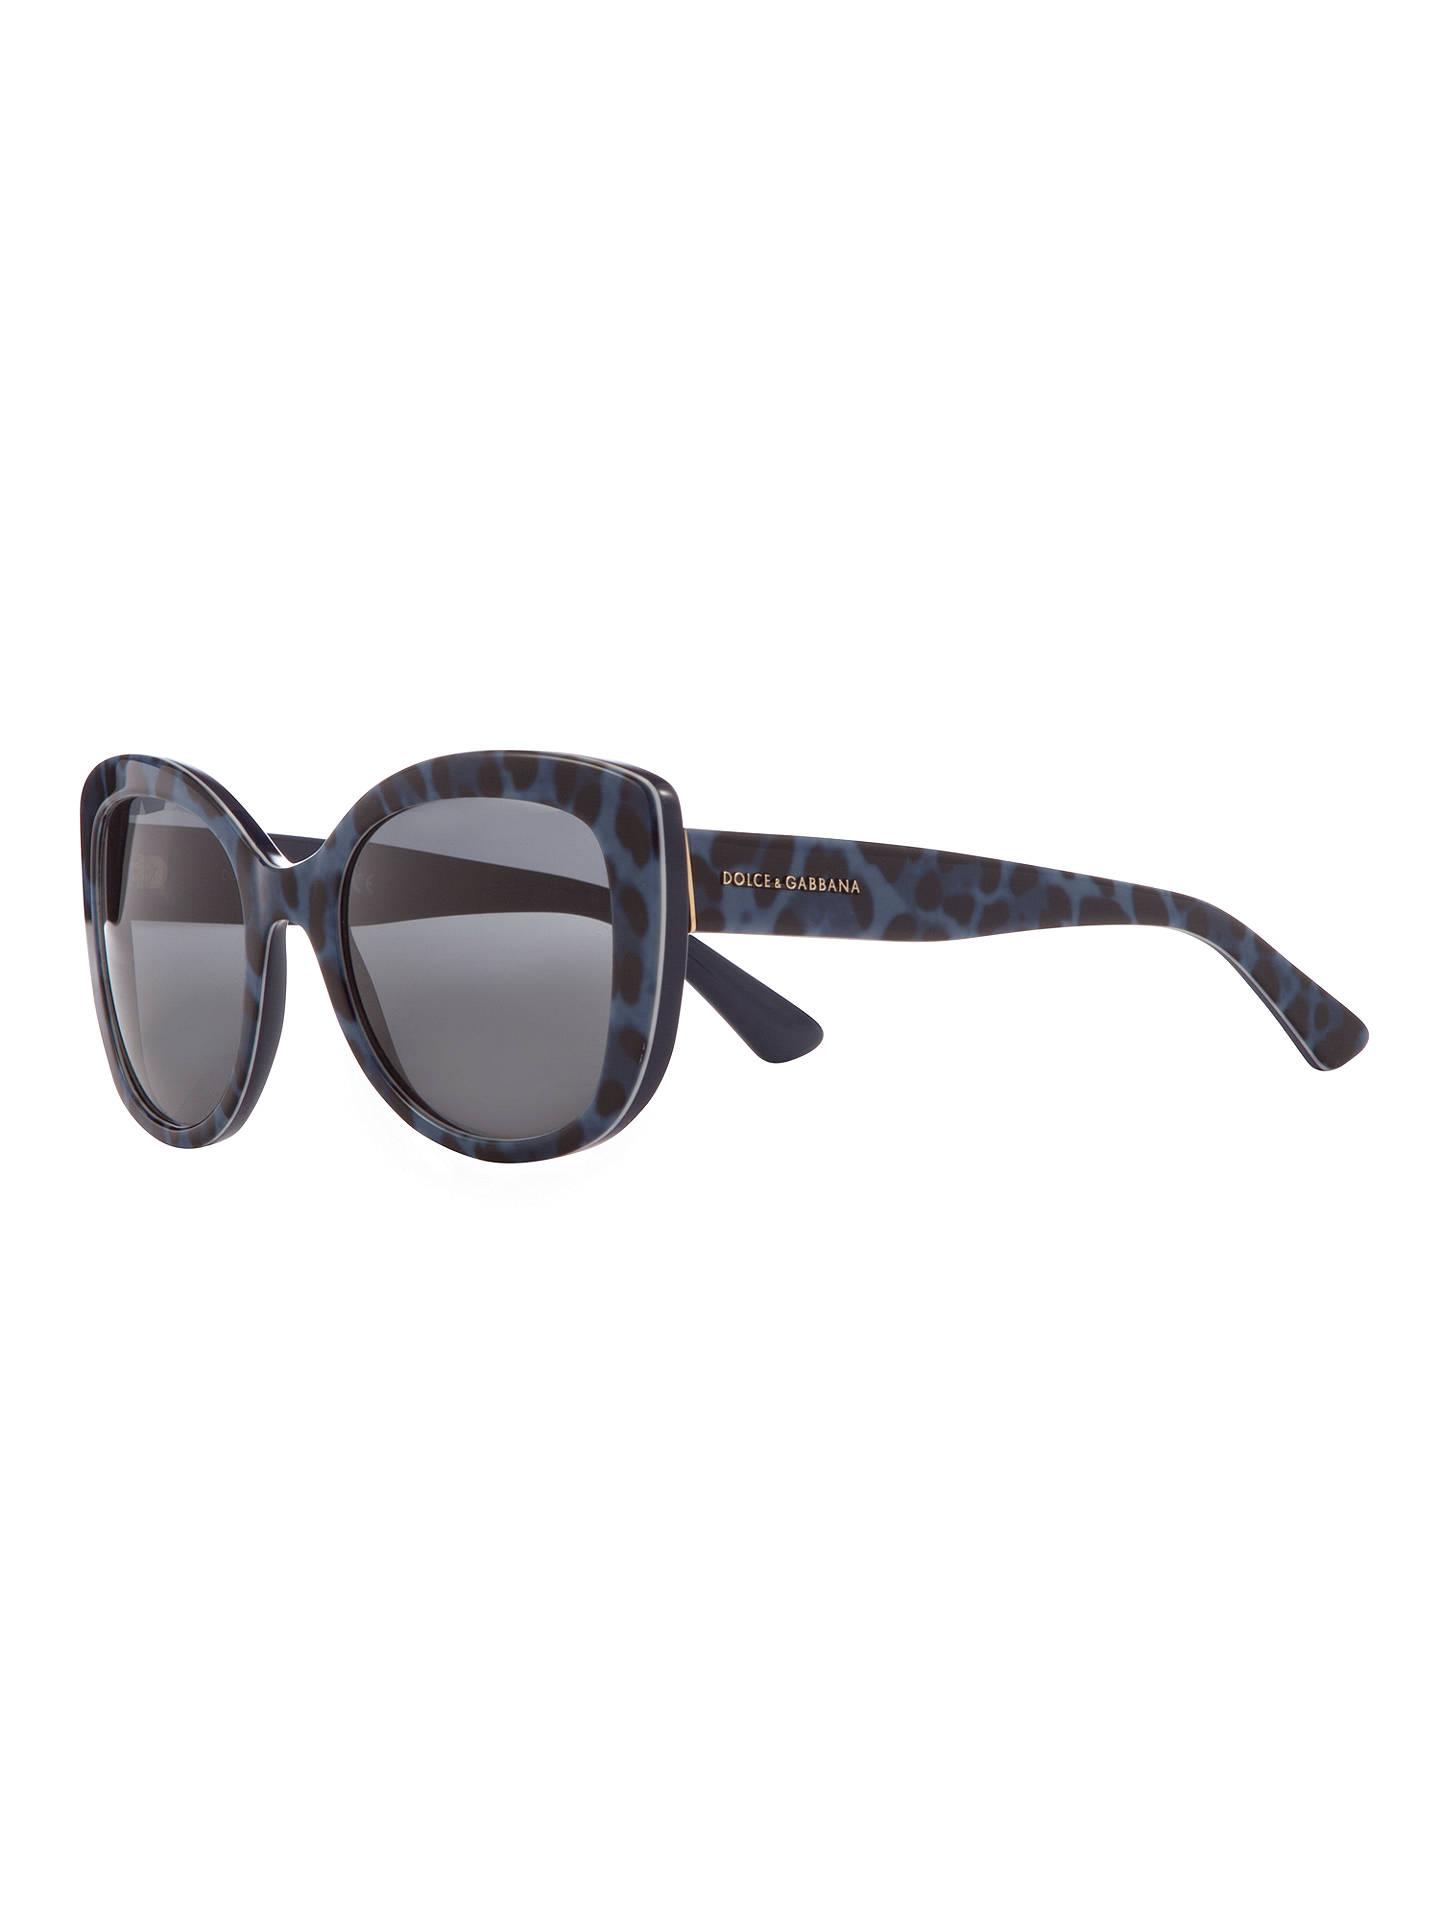 a21acbb9568f Buy Dolce & Gabbana DG4233 Cat Eye Sunglasses, Leo Blue Online at  johnlewis. ...